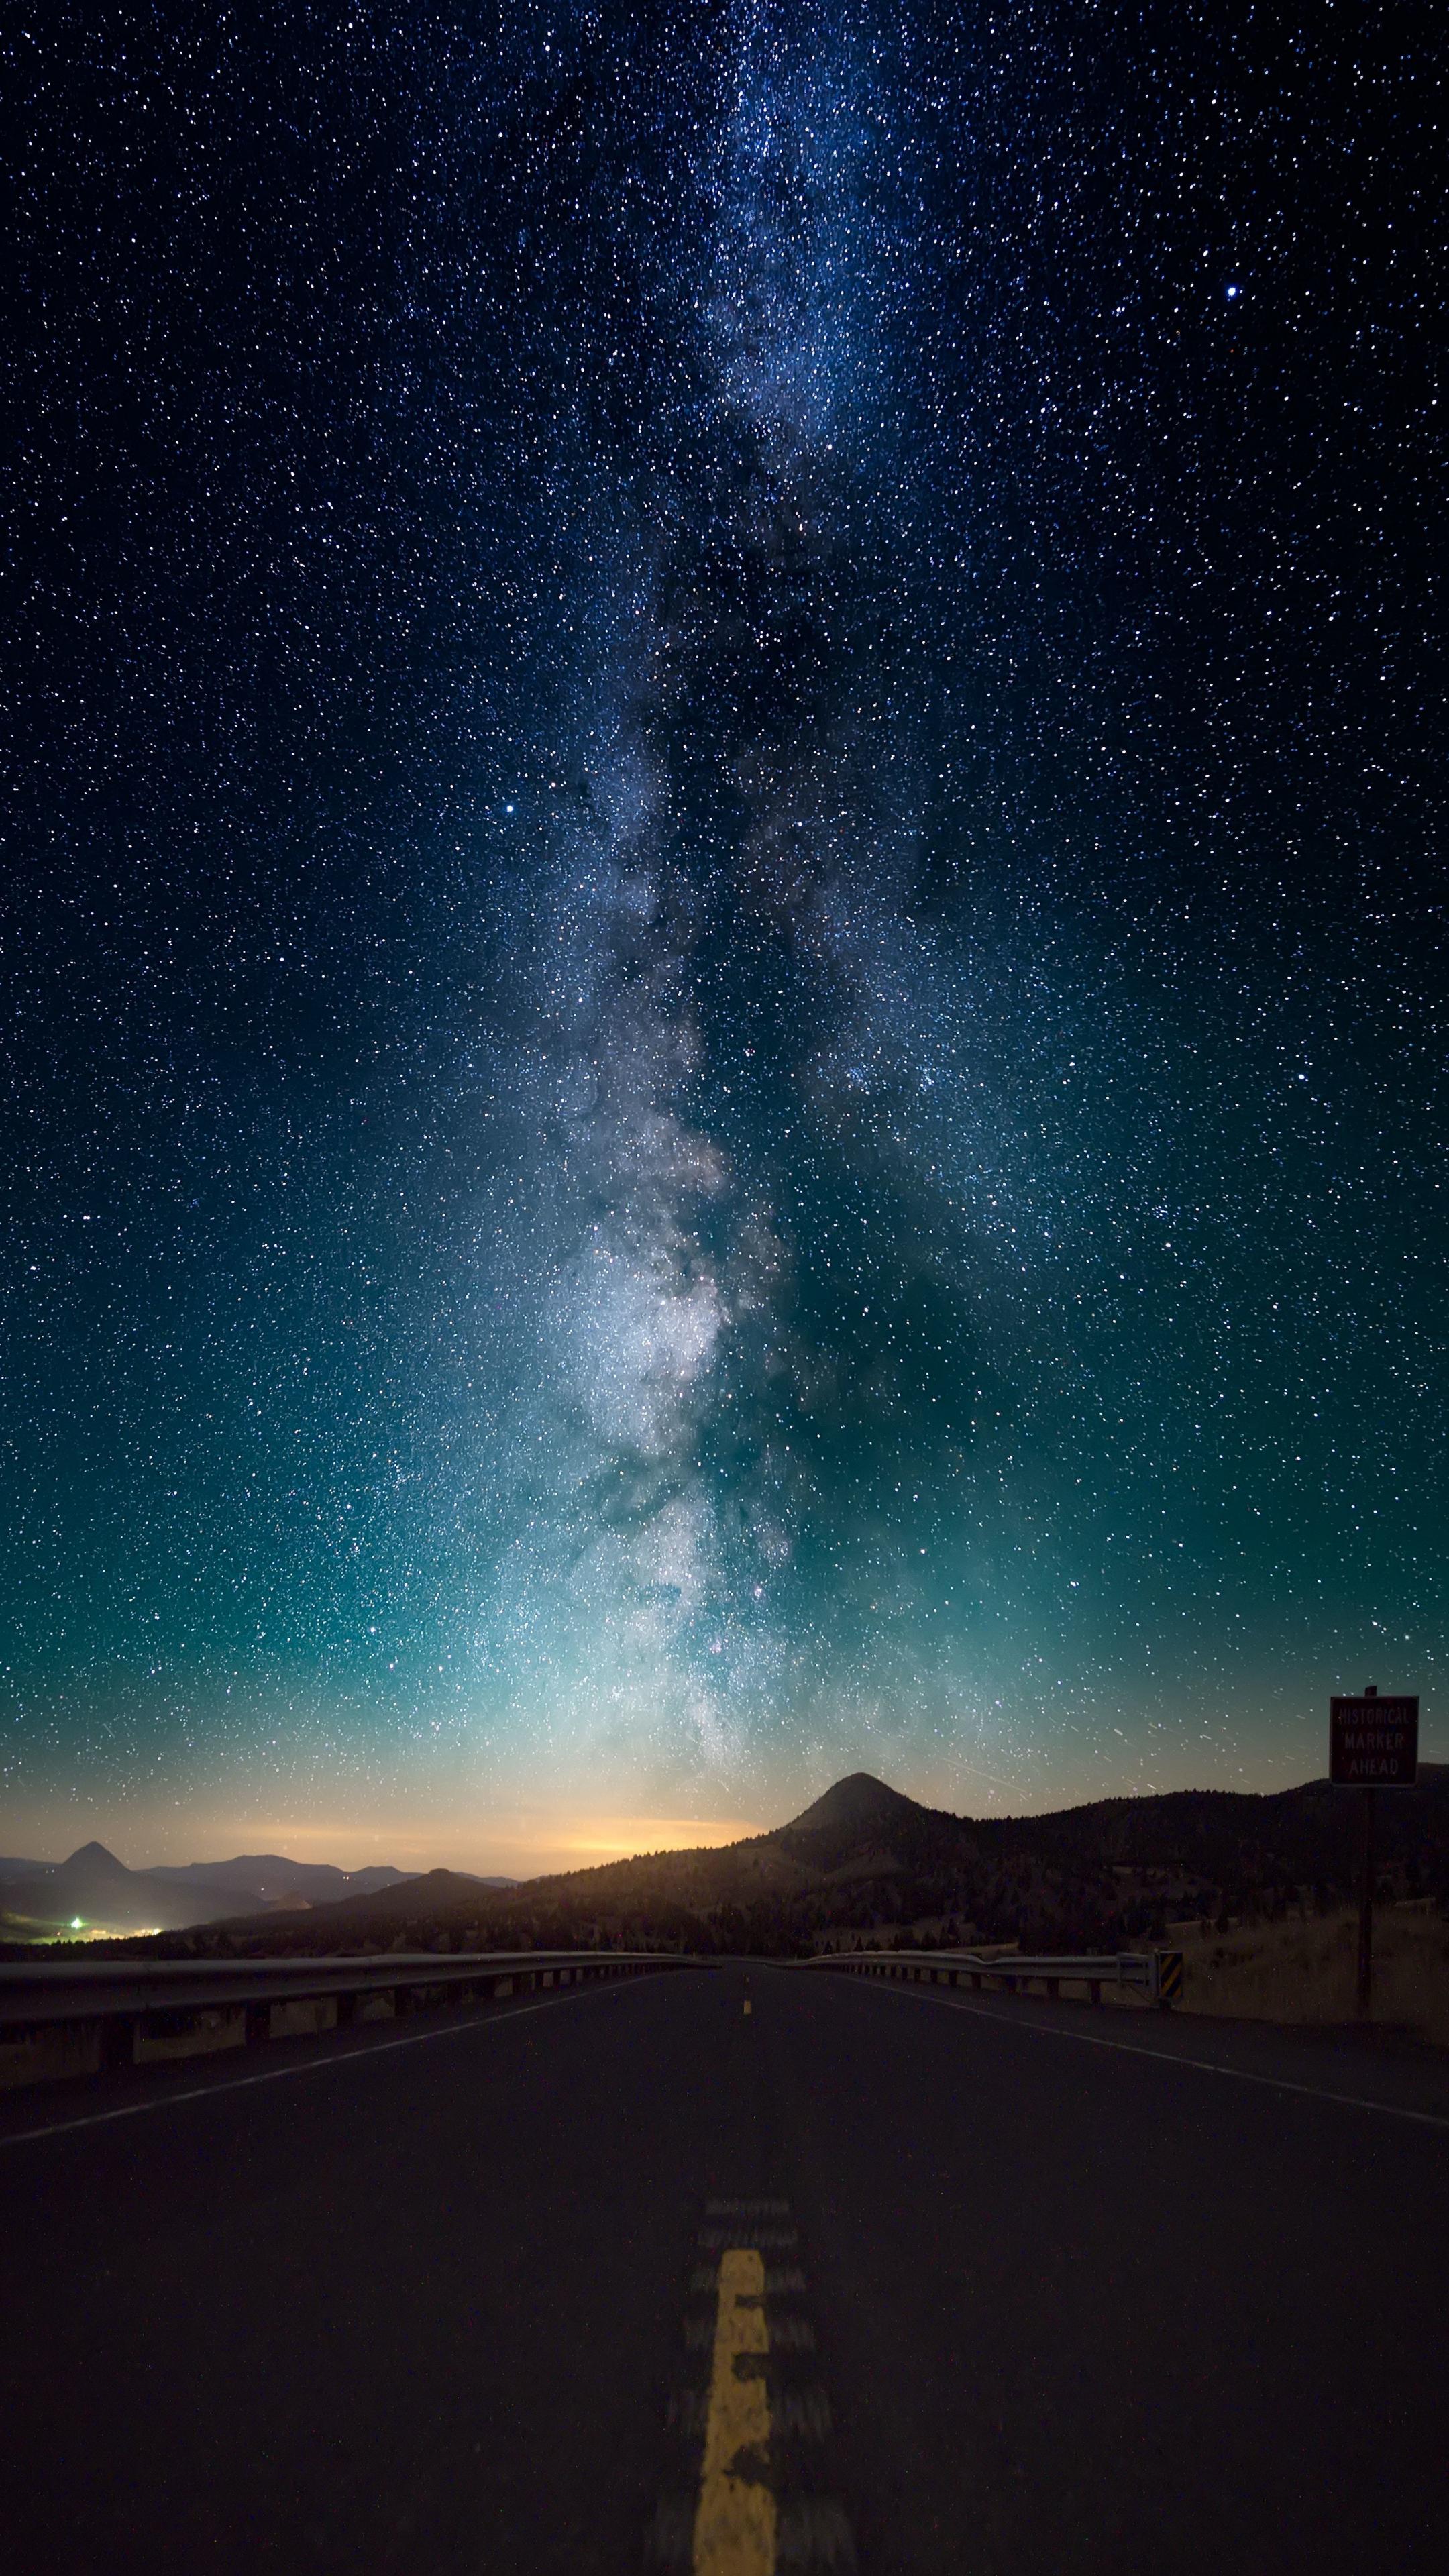 2160 x 3840 wallpaper - Starry sky 4k ...